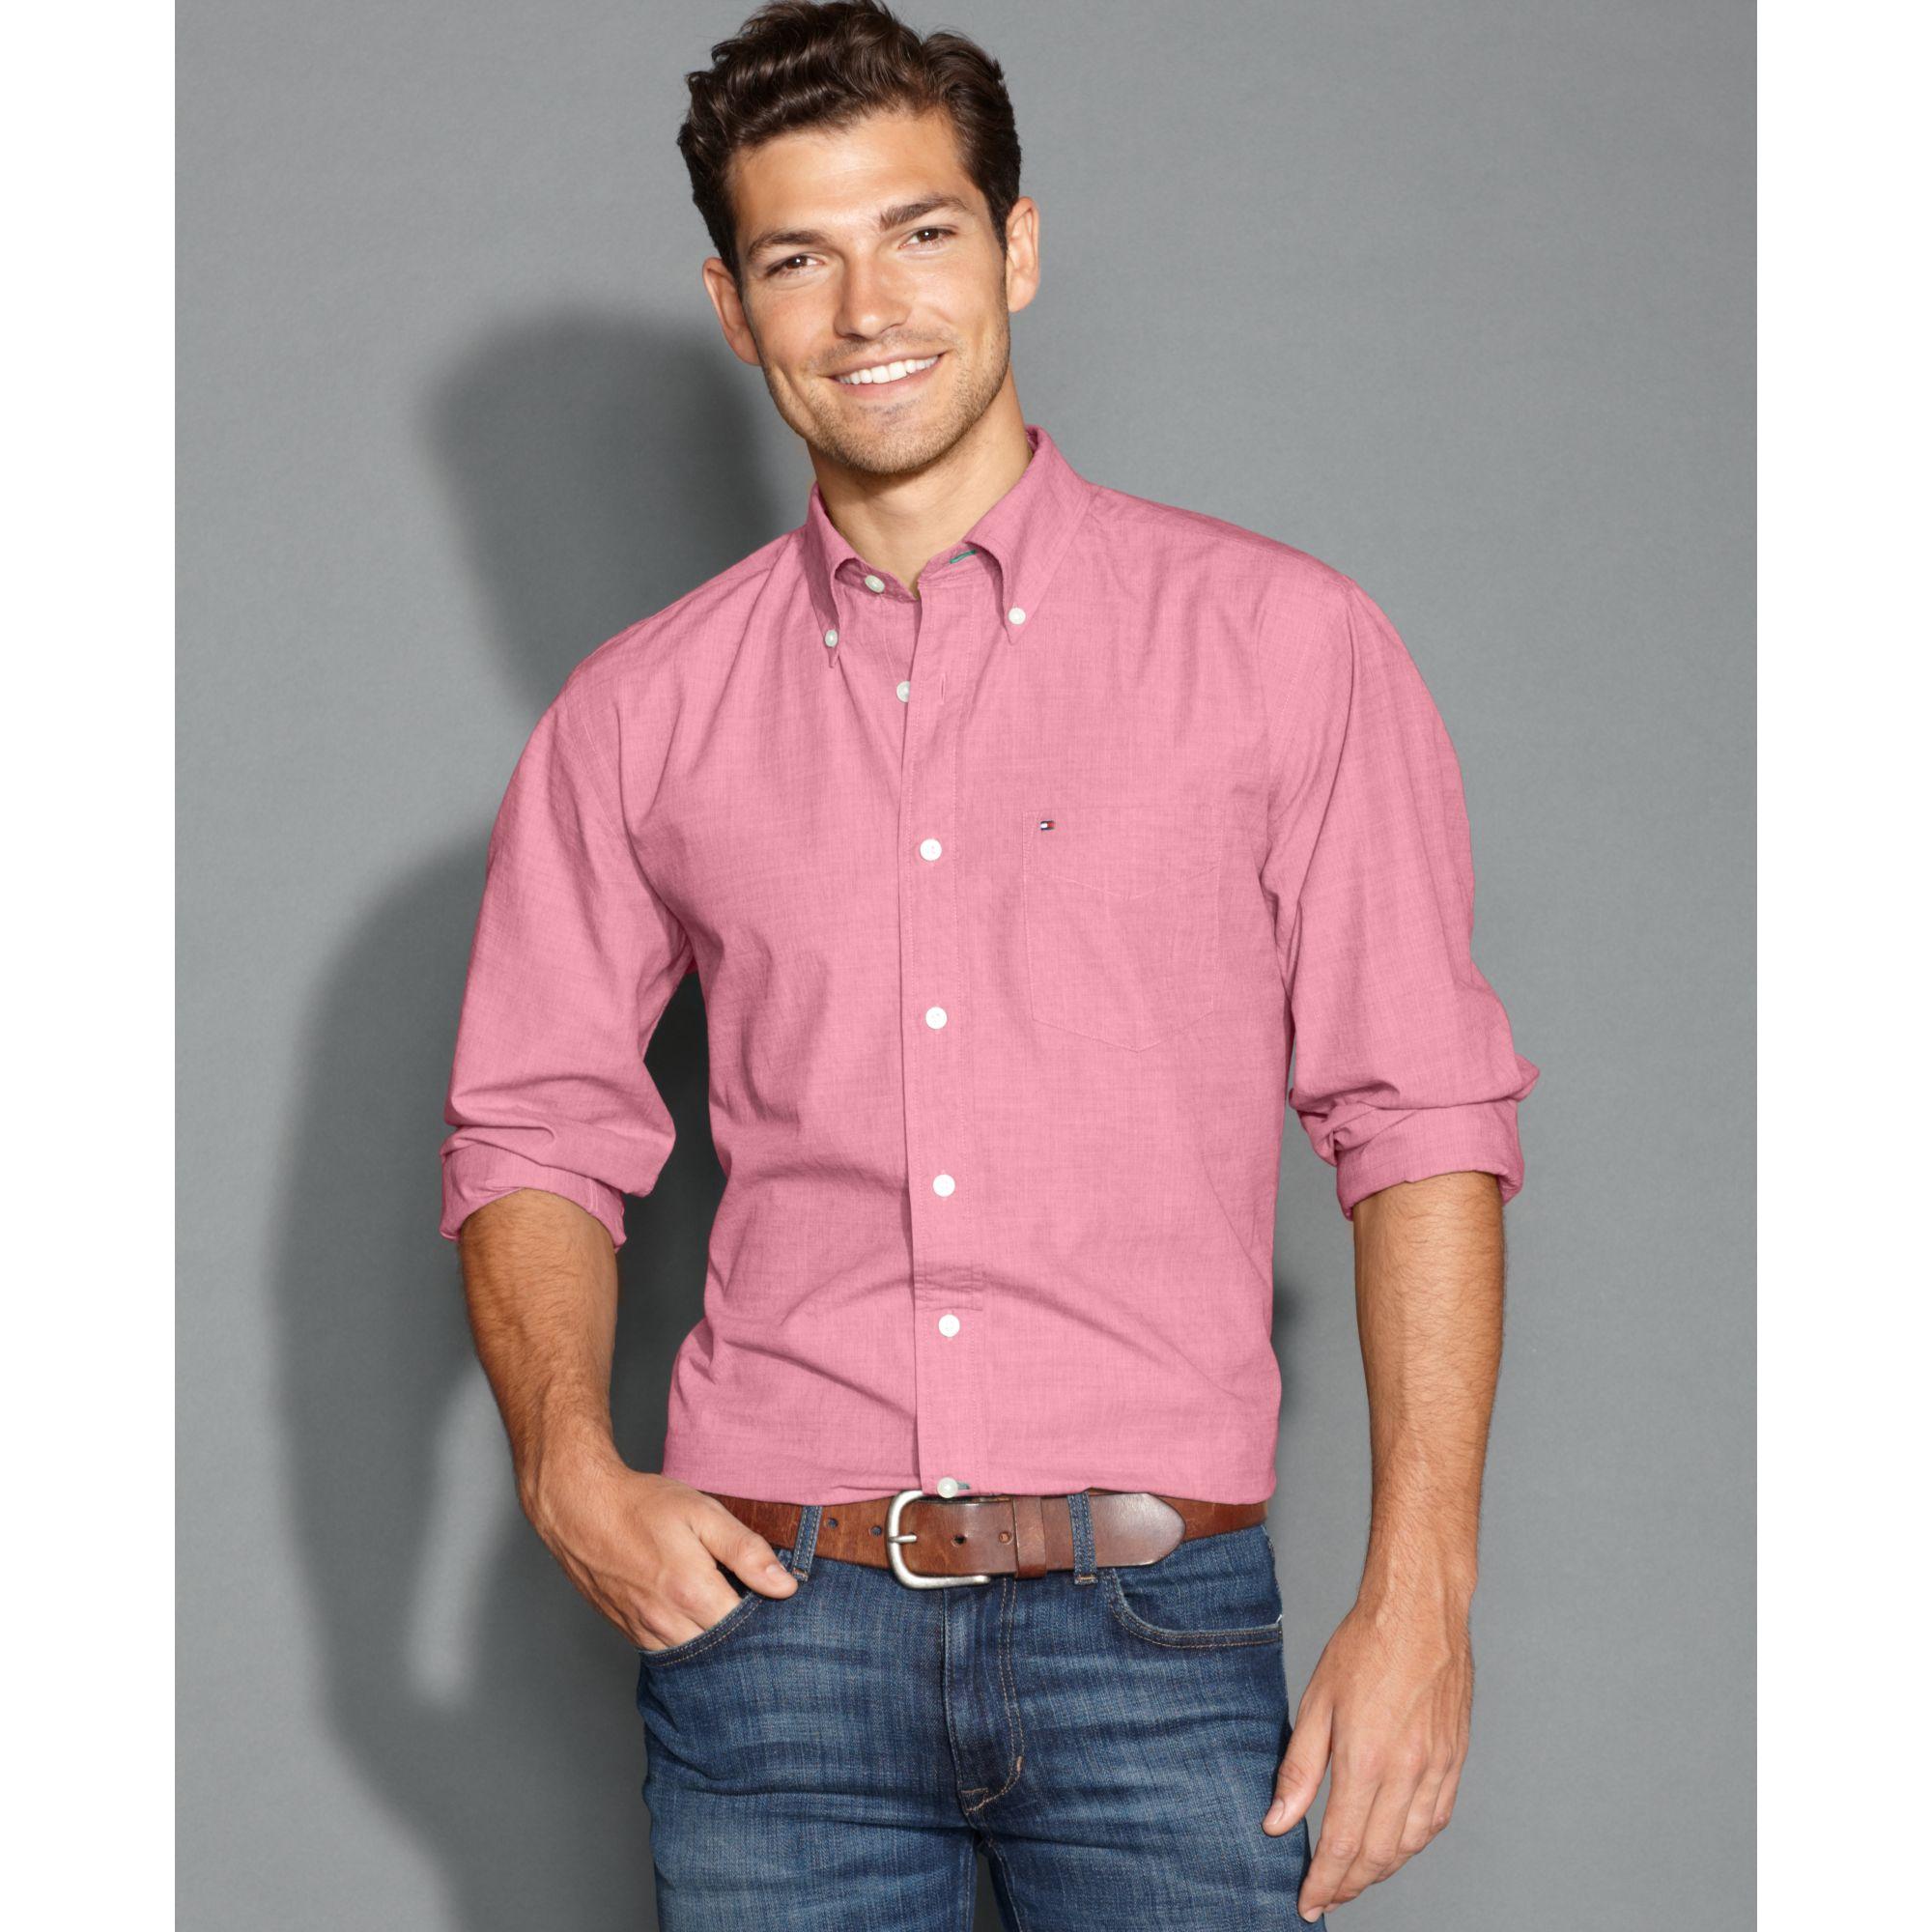 Lyst Tommy Hilfiger Big And Tall Longsleeve Vineyard Striped Shirt